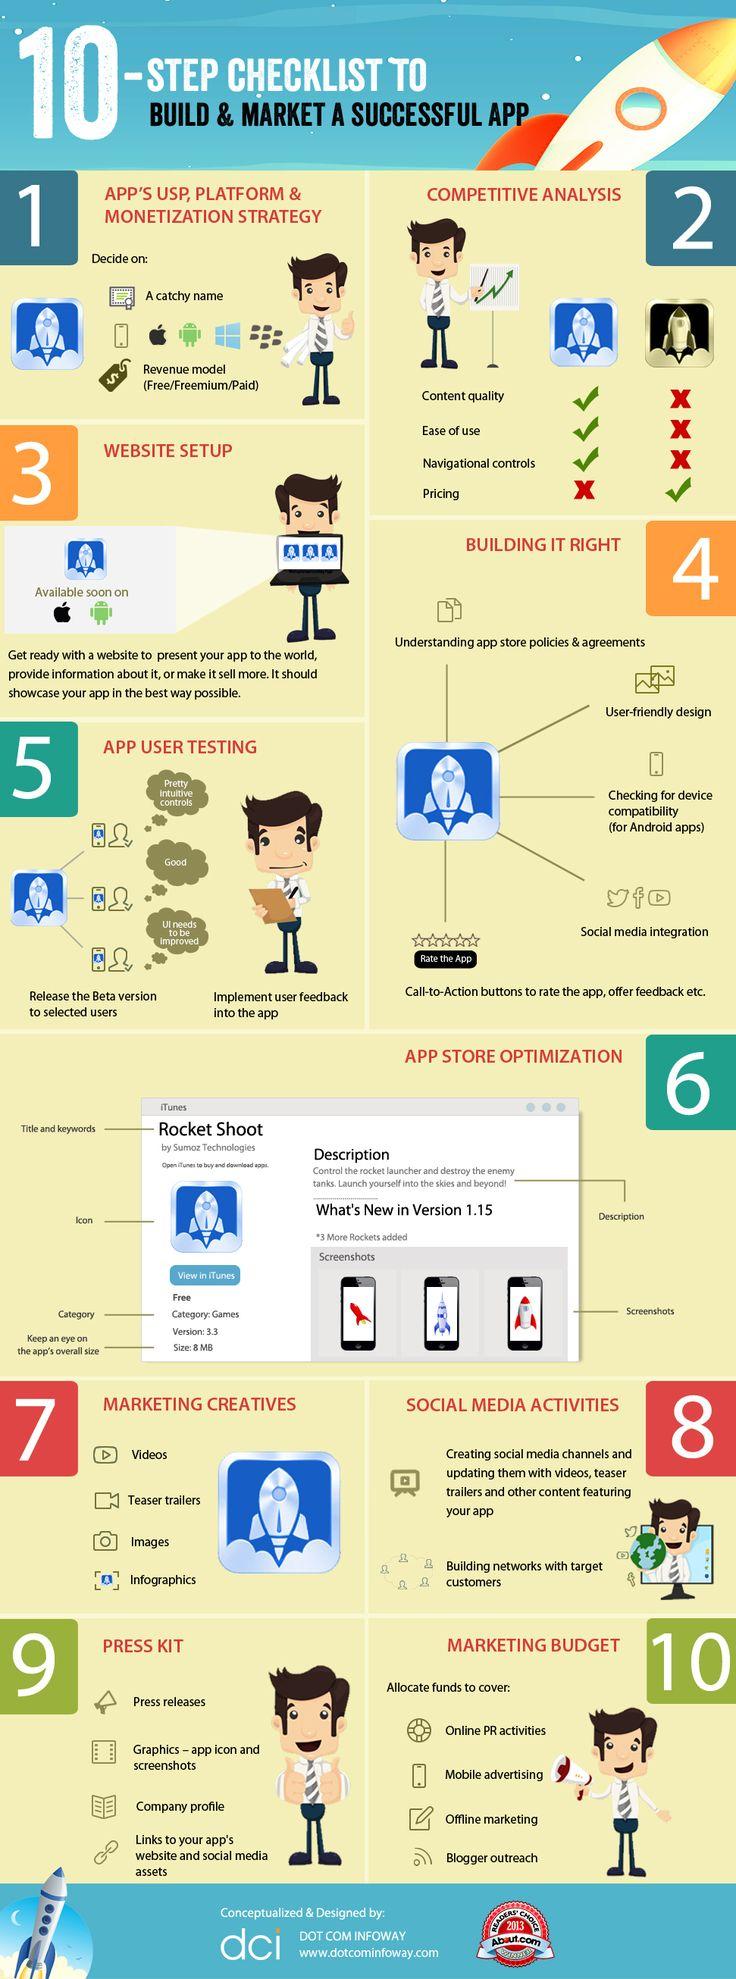 How to Build a Killer App for Your Business (Infographic) | Inc.com